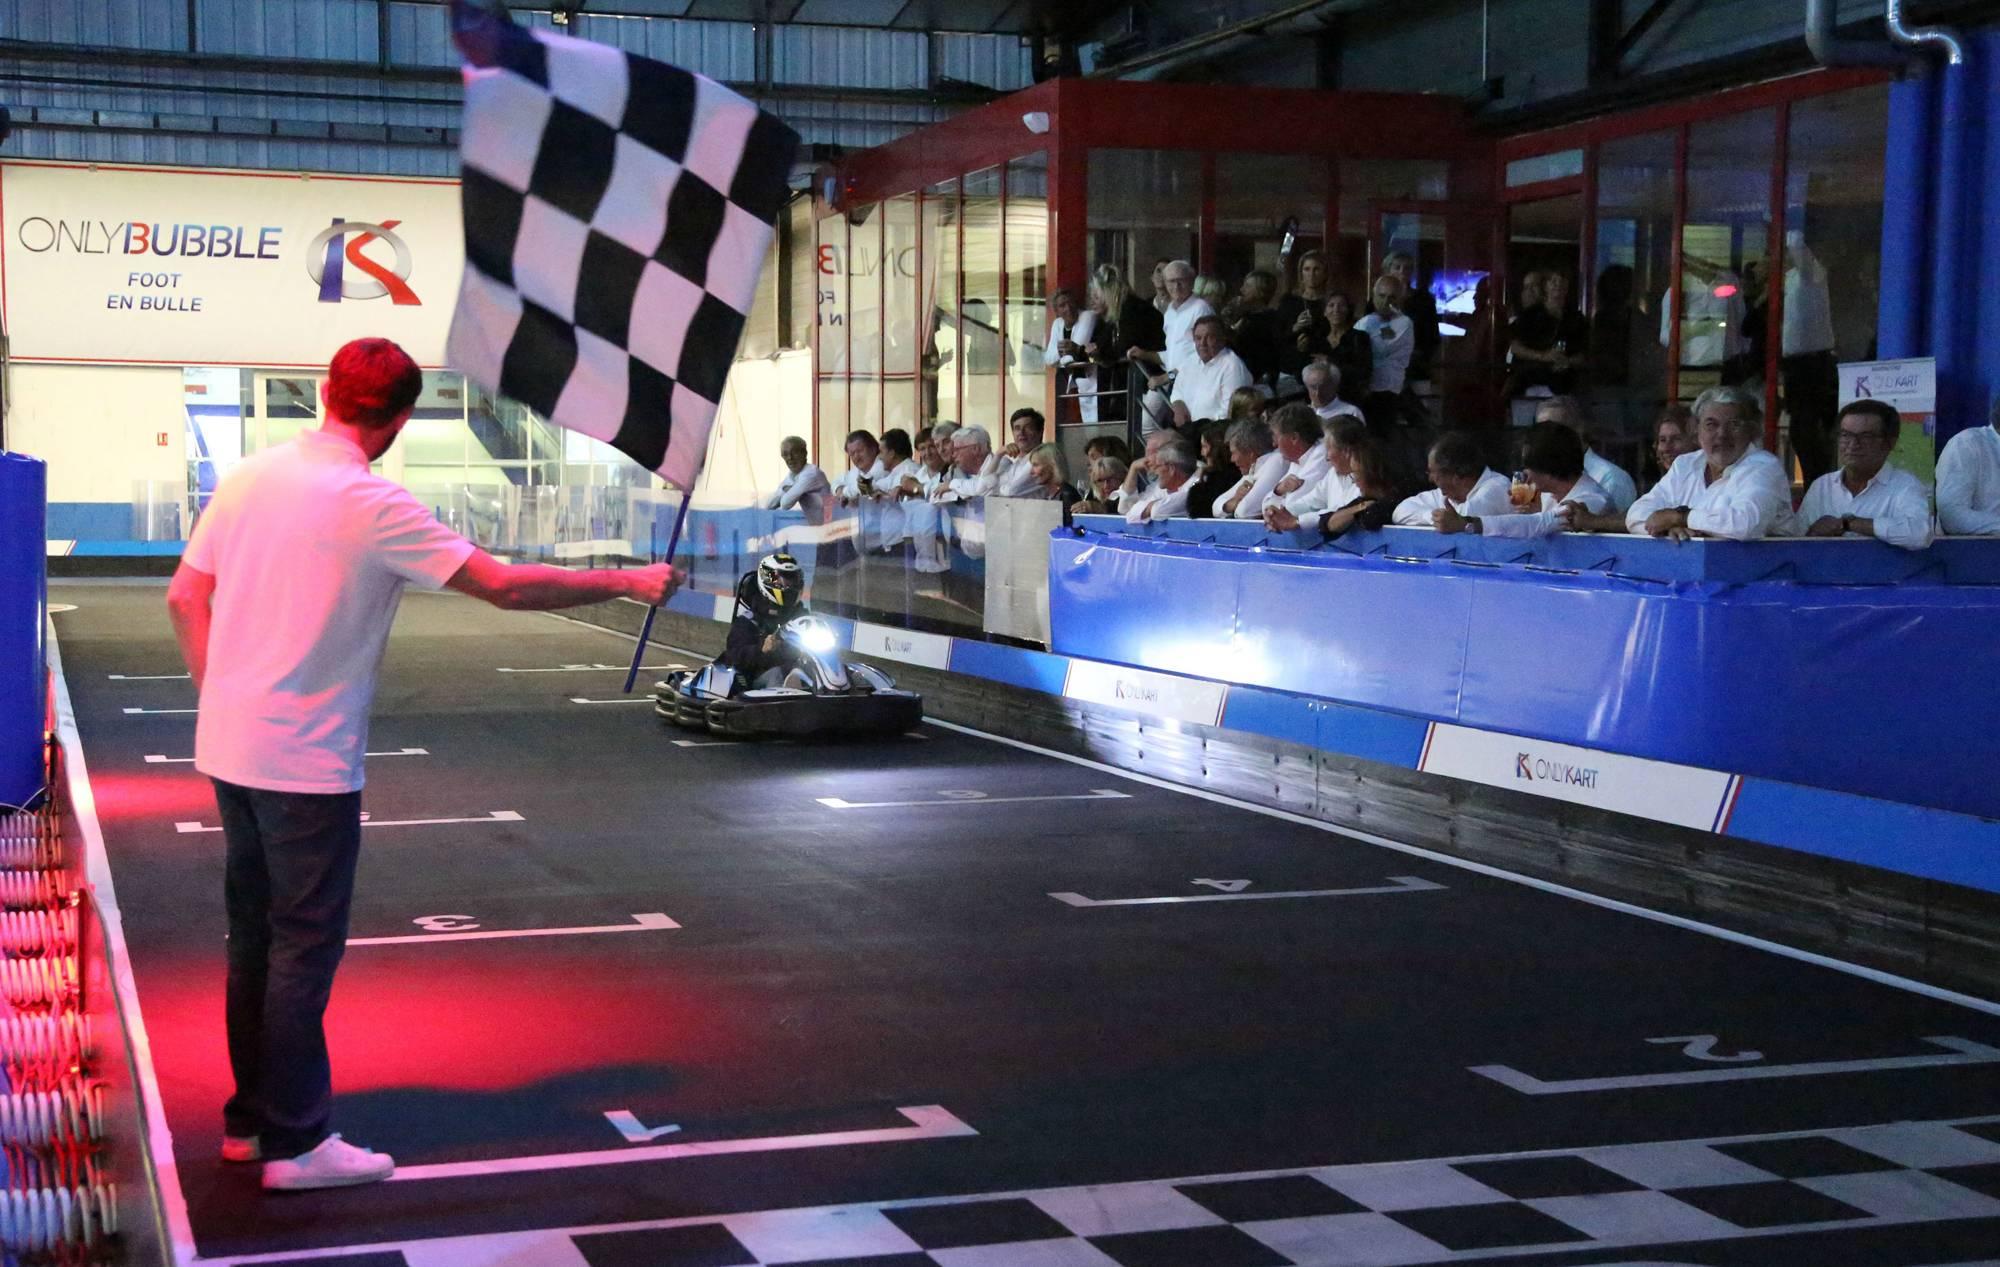 grand prix karting entreprises à lyon